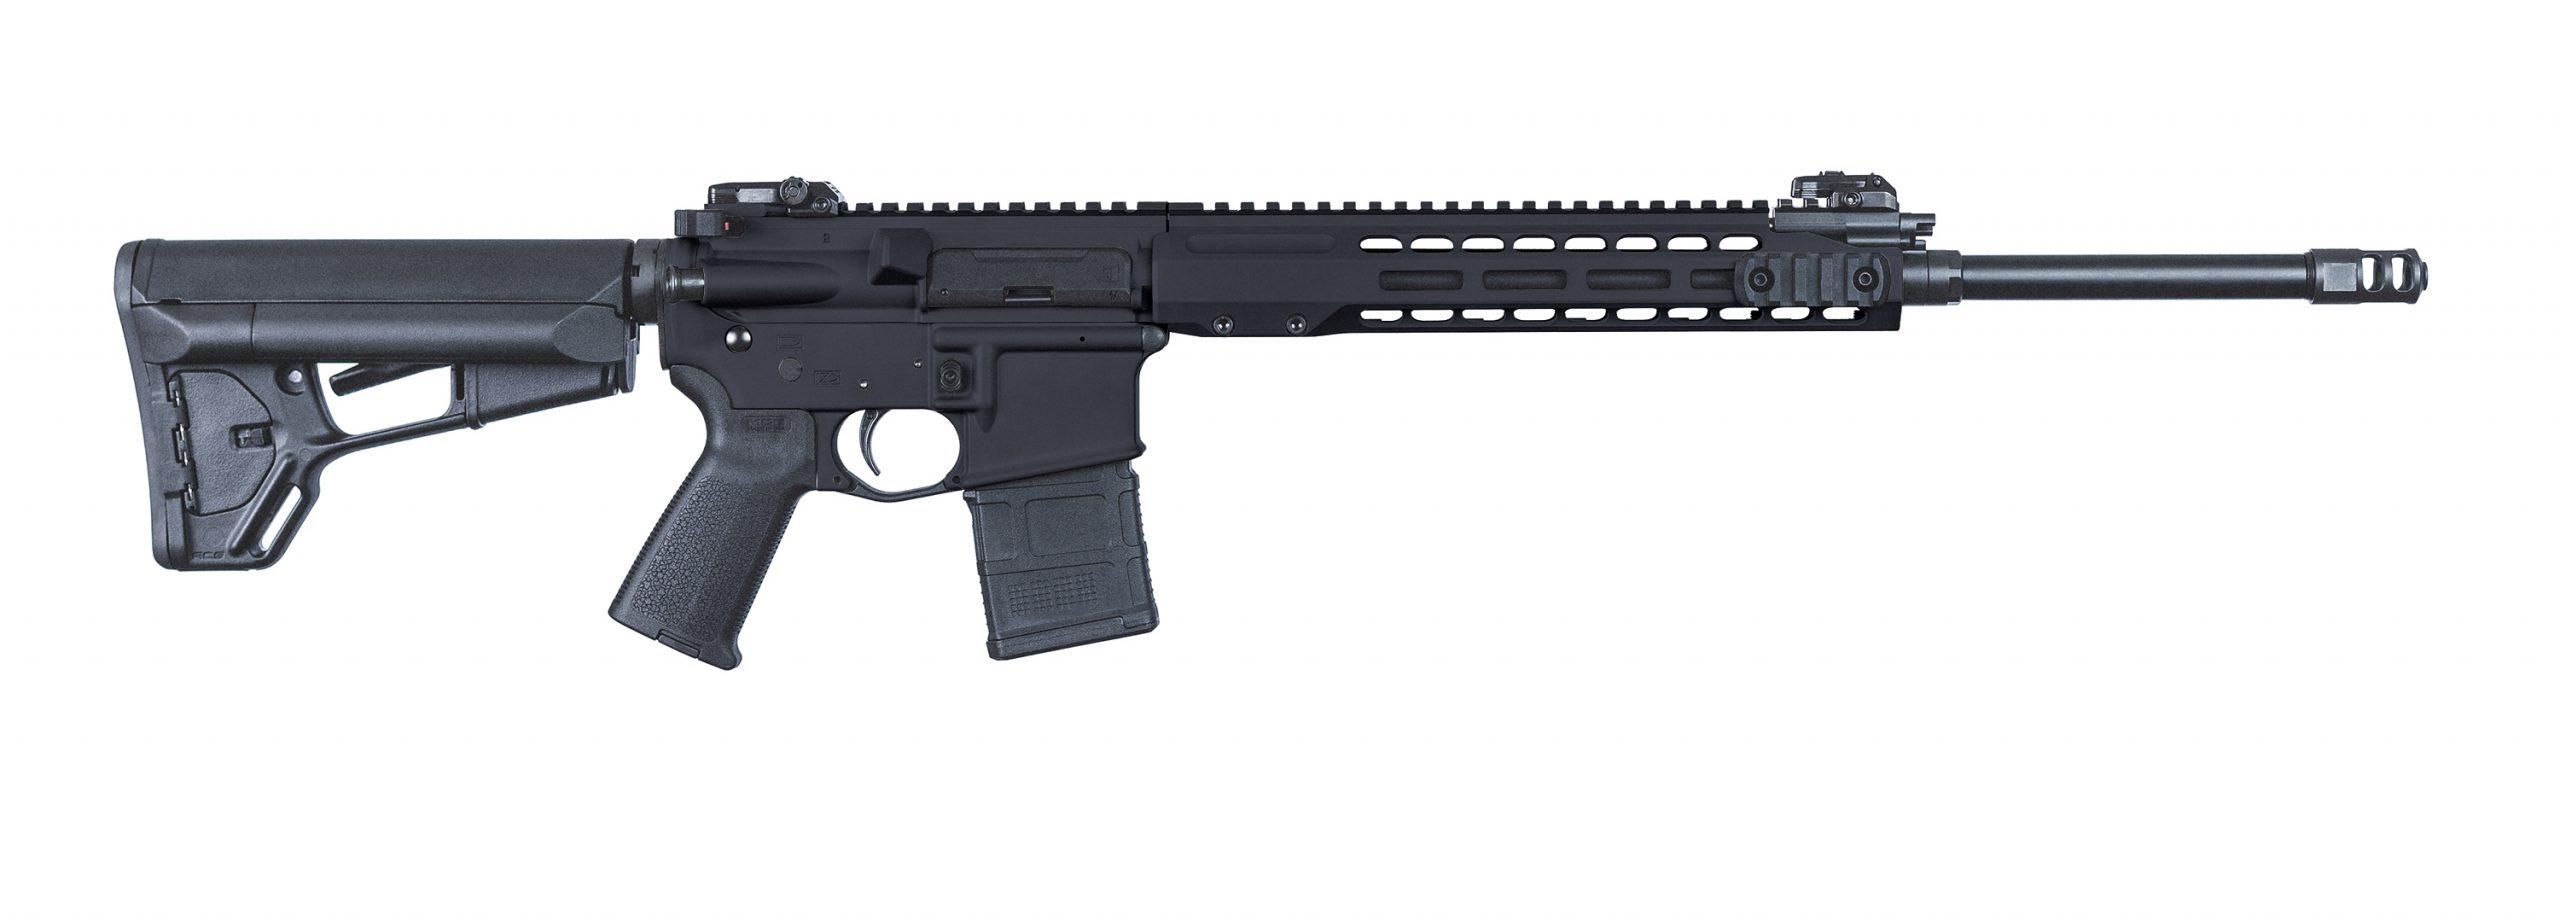 Barrett Firearms REC7 DMR 223 Rem | 5.56 NATO